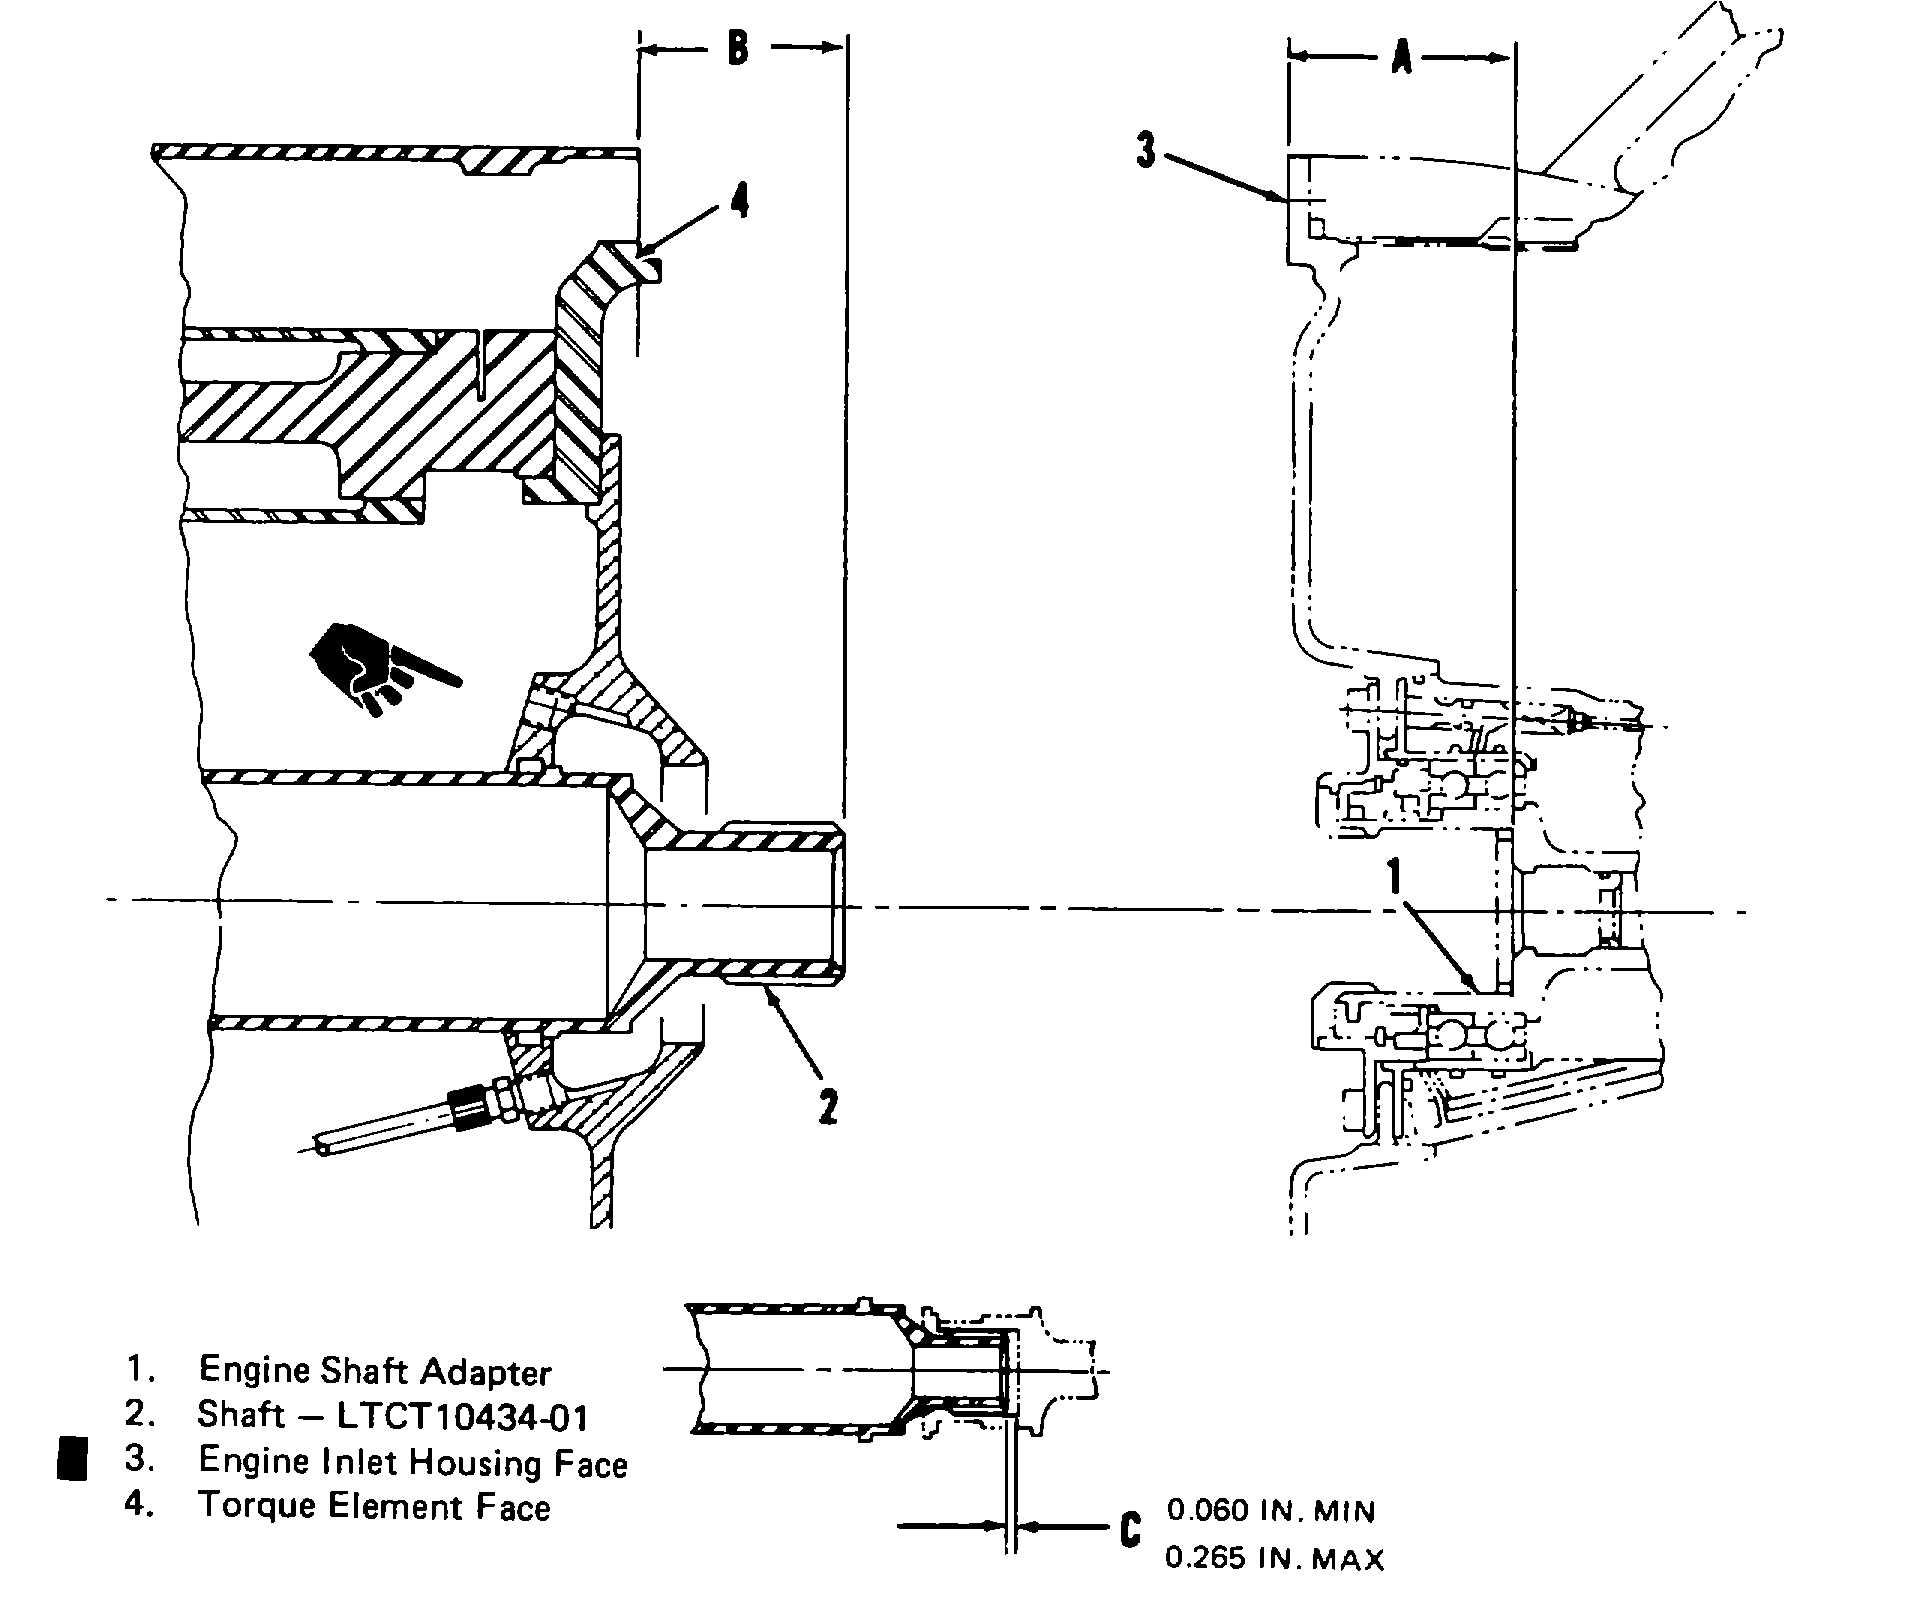 diagram free image chevy trailblazer parts diagram html